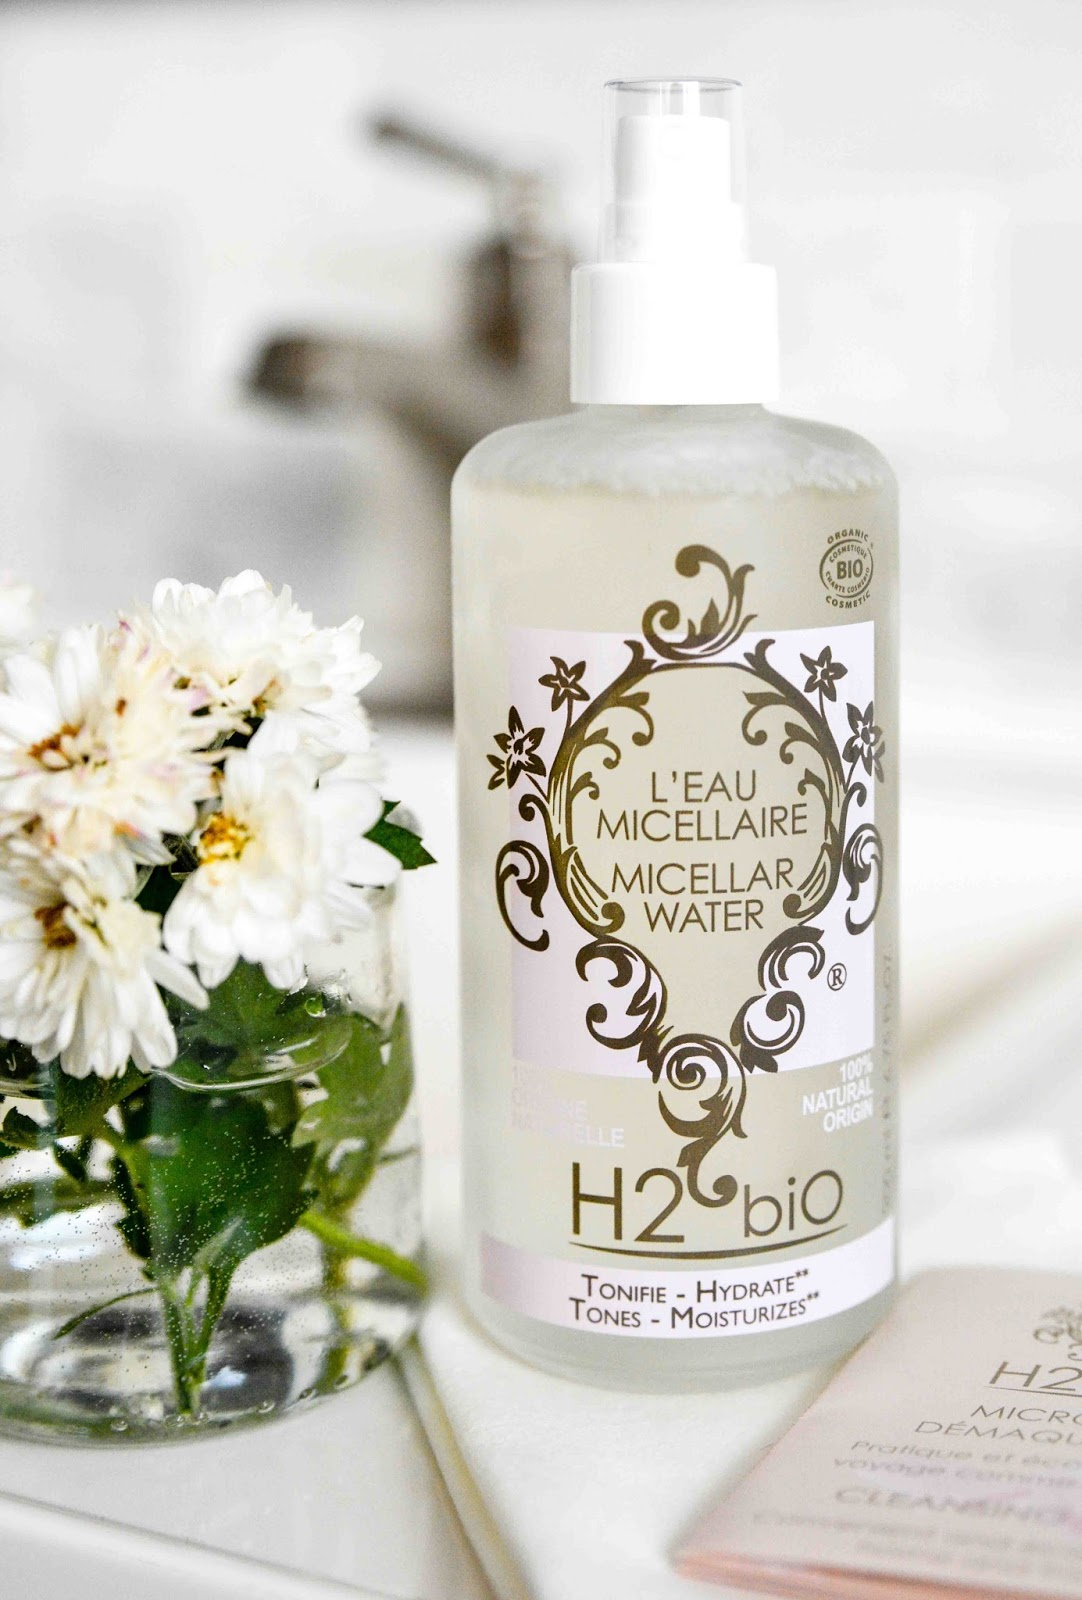 H2biO Micellar Water